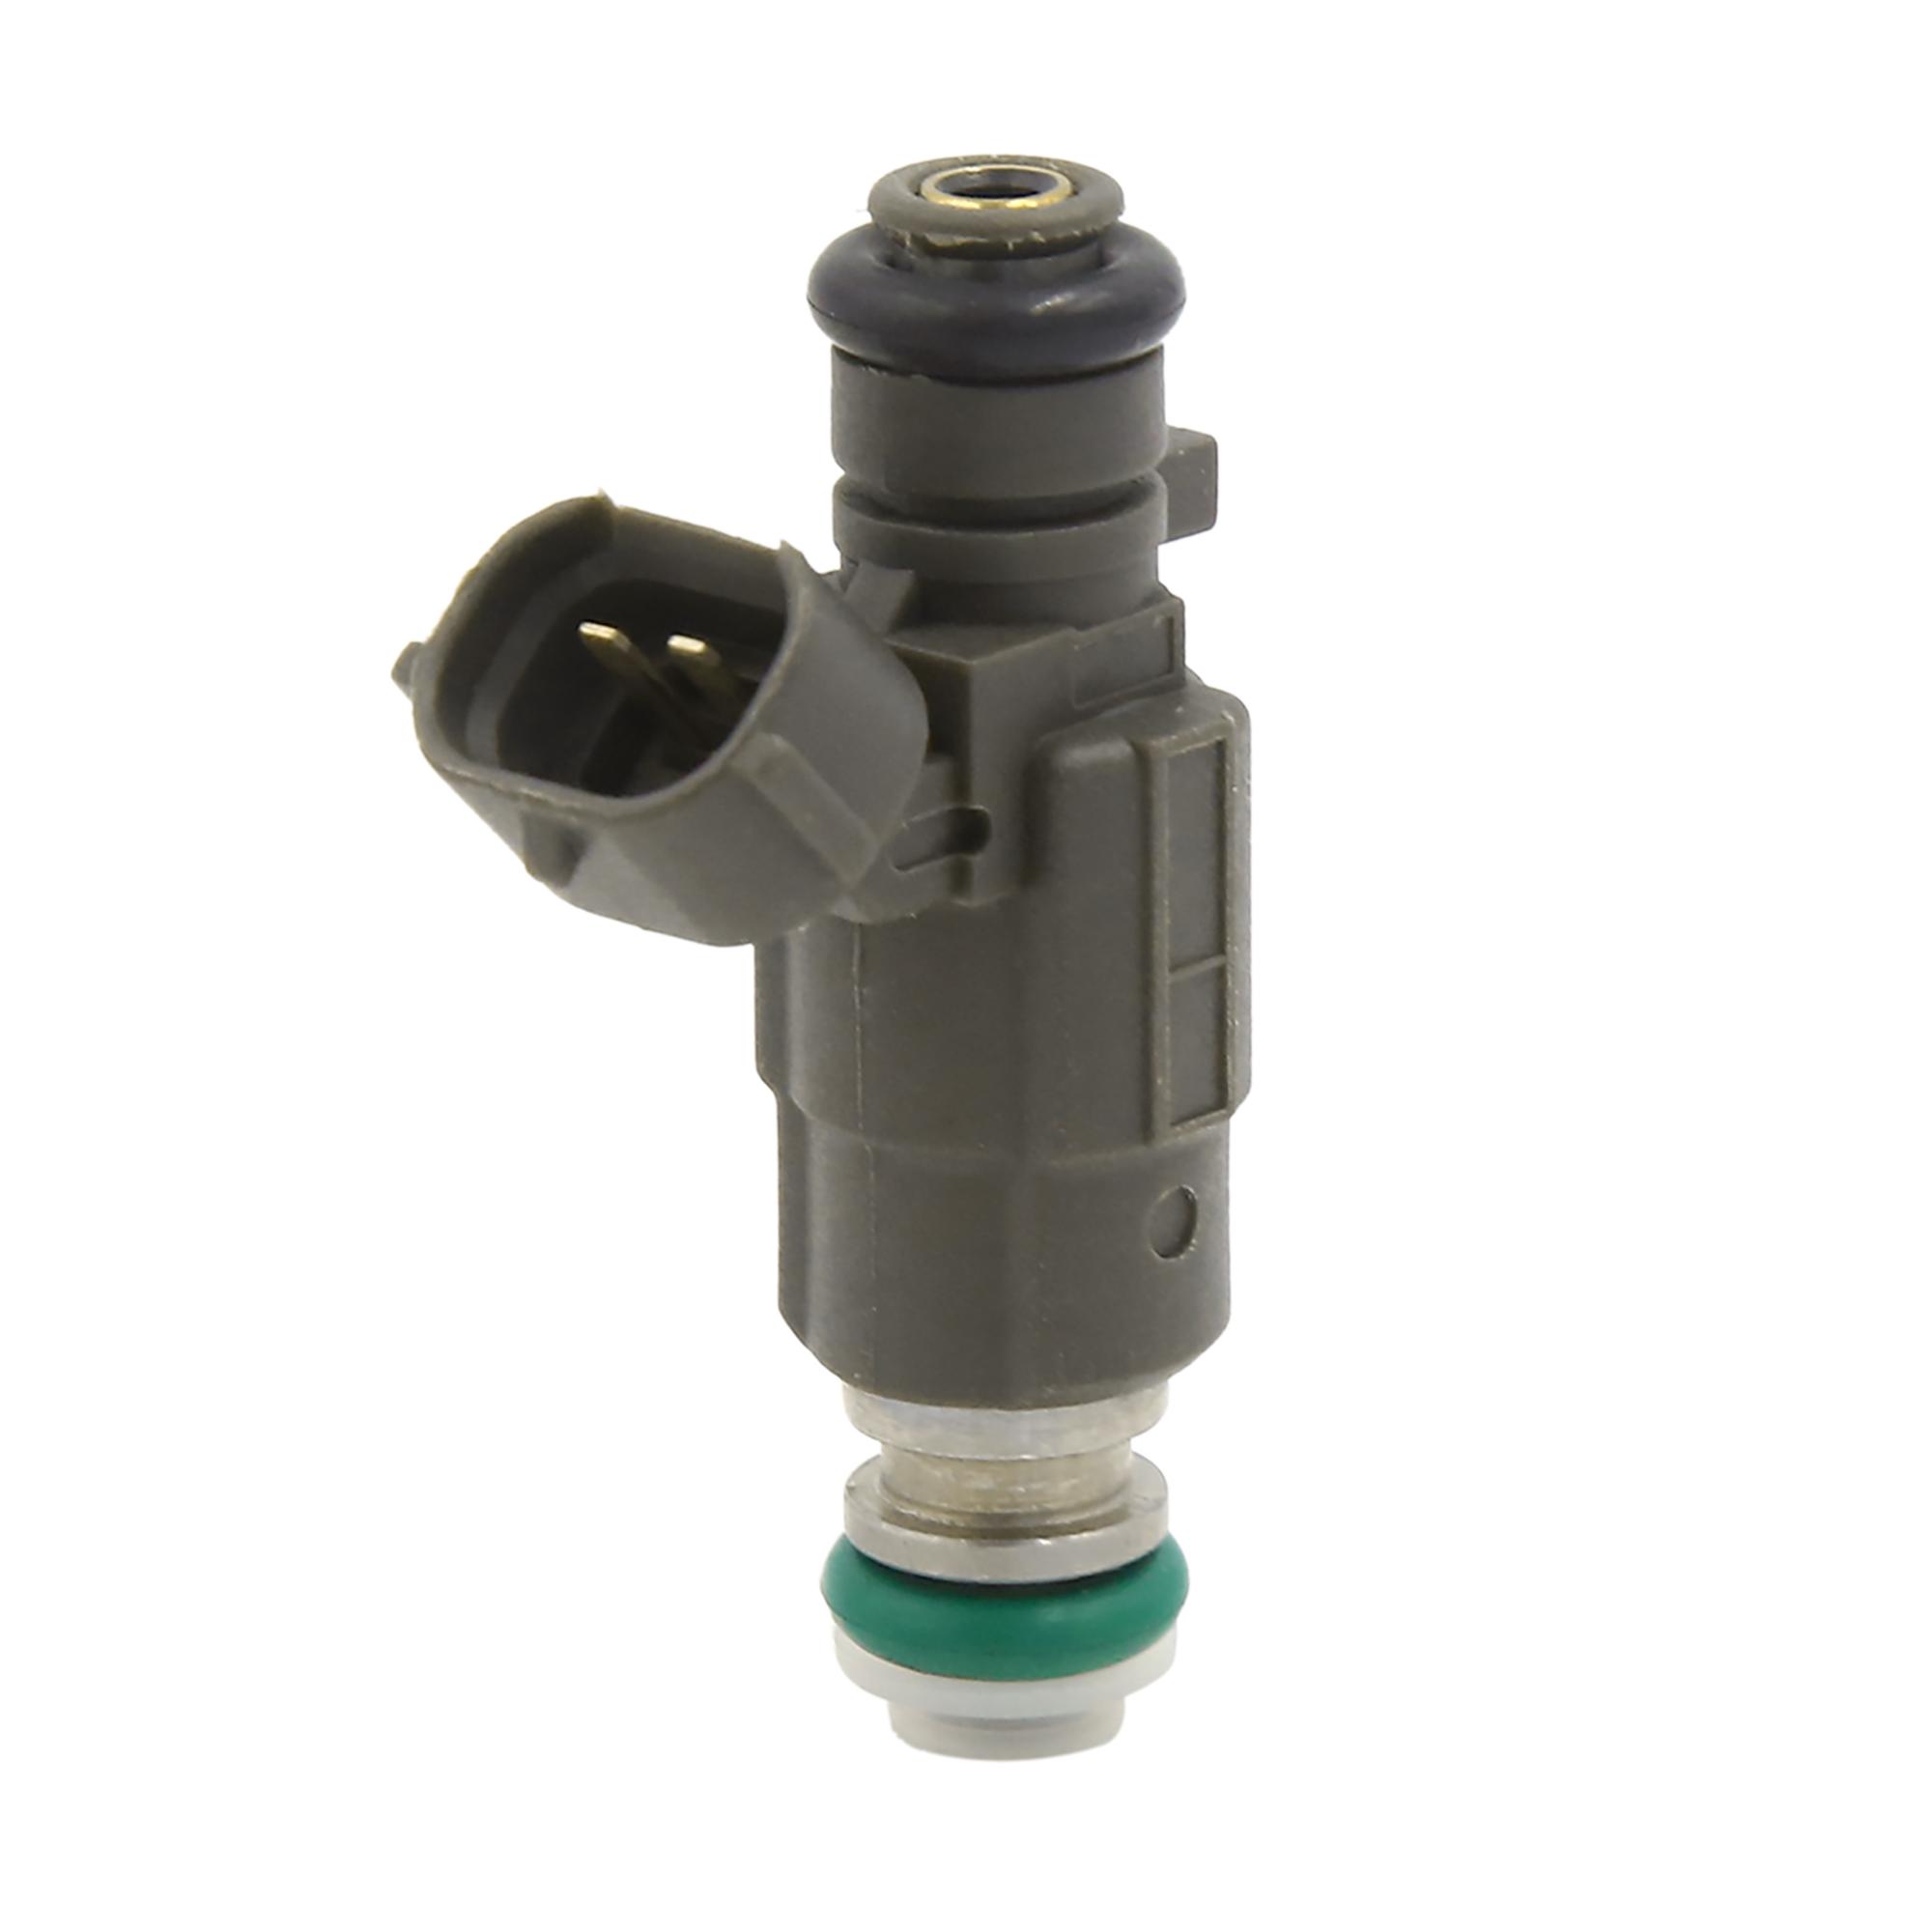 FBJC100 Flow Matched Fuel Injector for Nissan 350Z Infiniti G35 2.0L 3.0L 3.5L